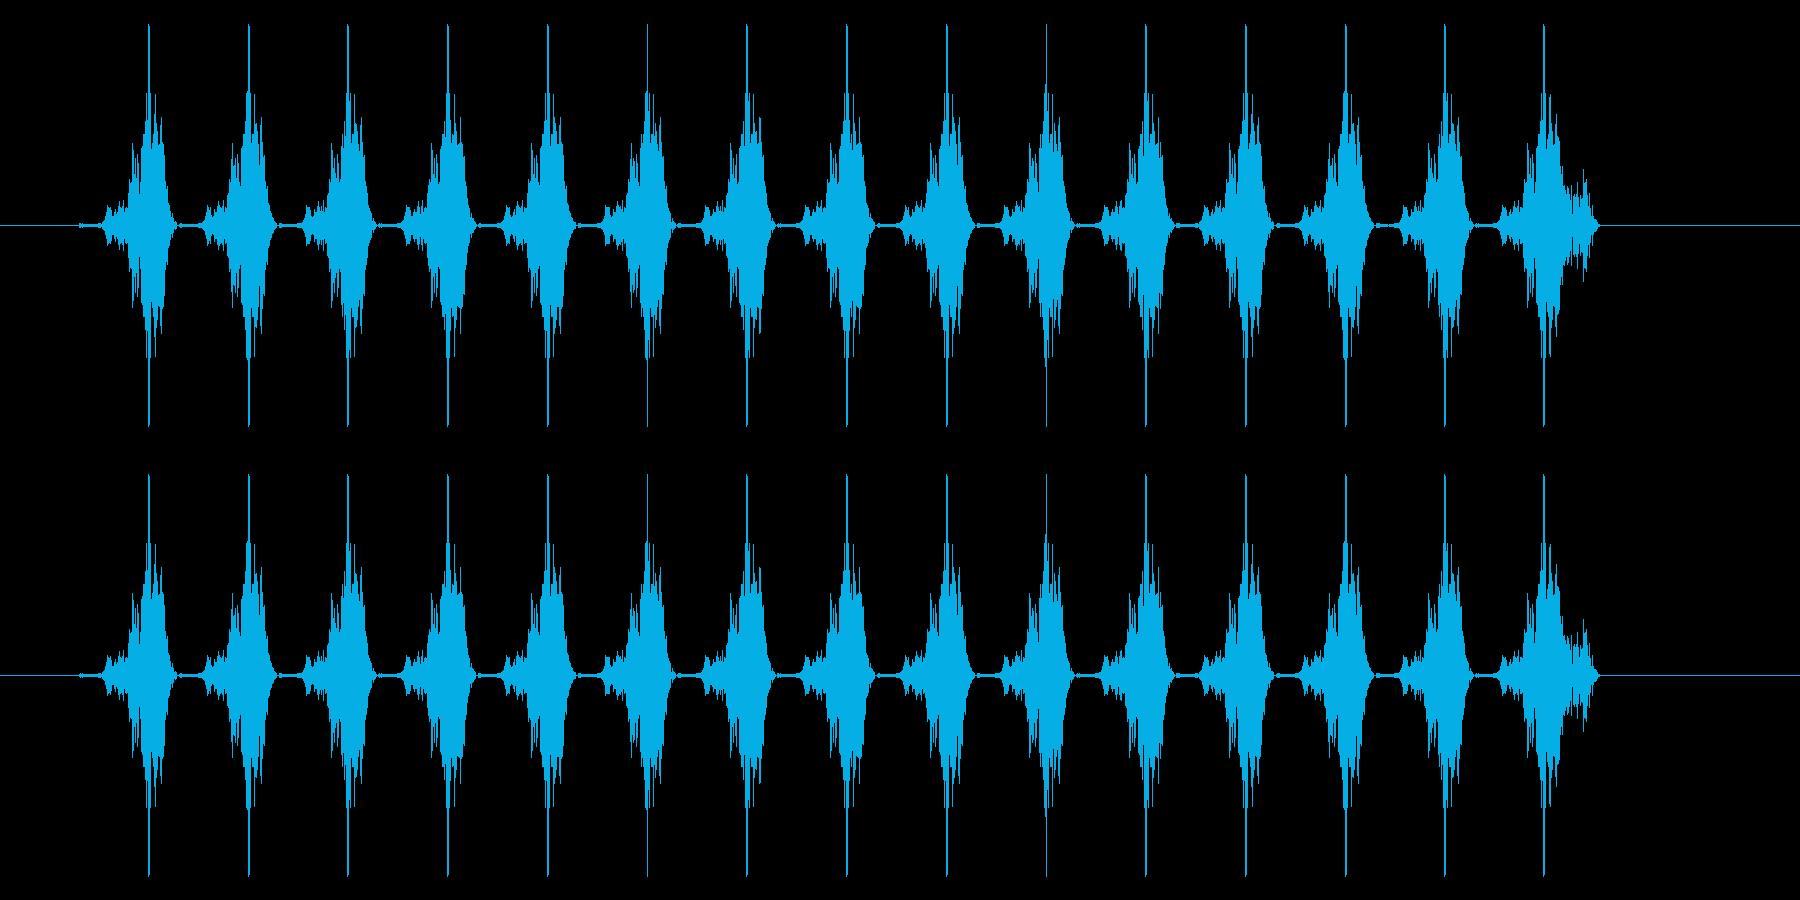 SNES-アクション01-18(メッセーの再生済みの波形